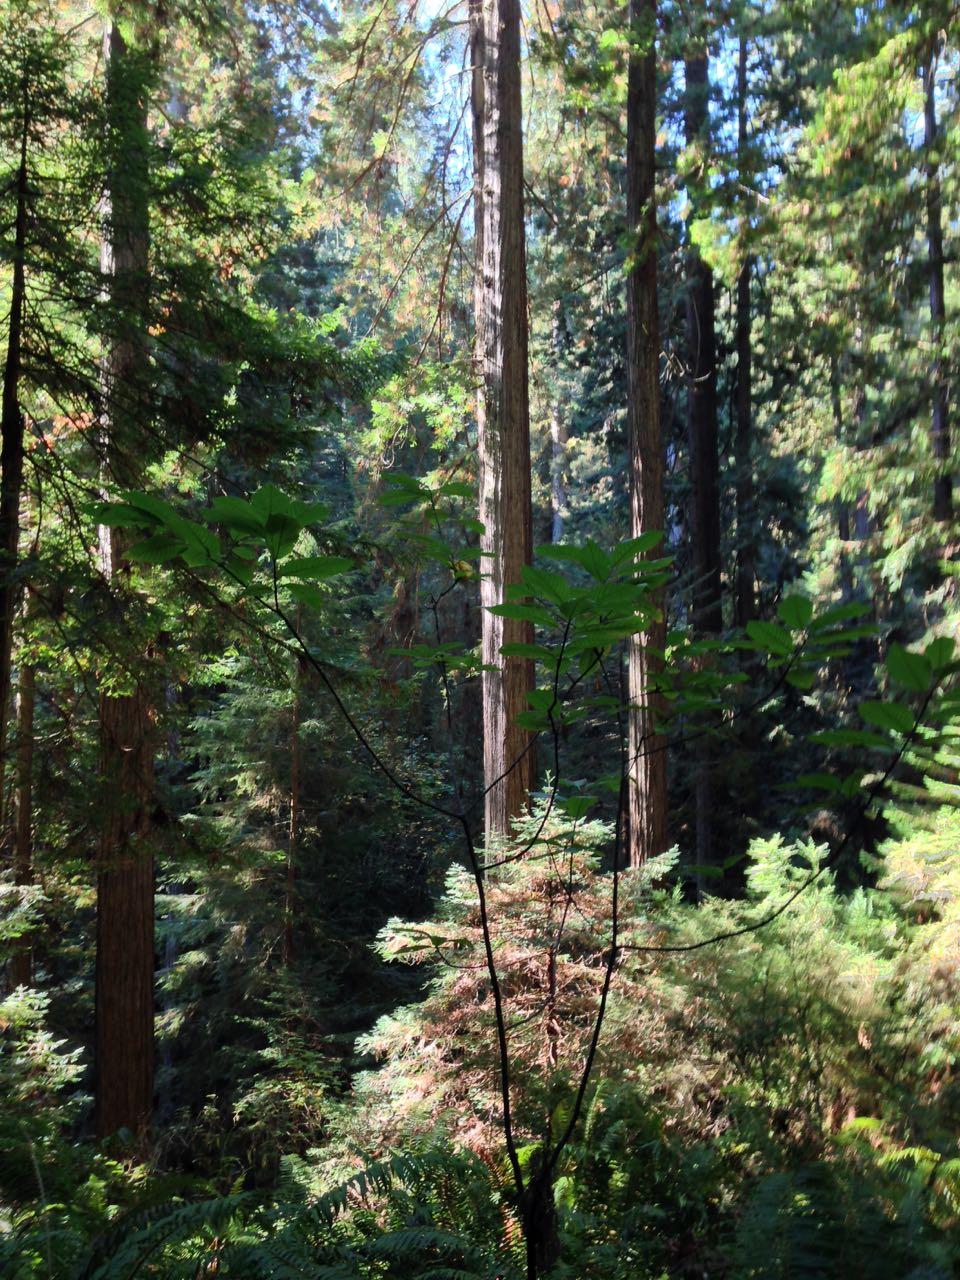 Redwoods 2017 10 08 224 Of 287